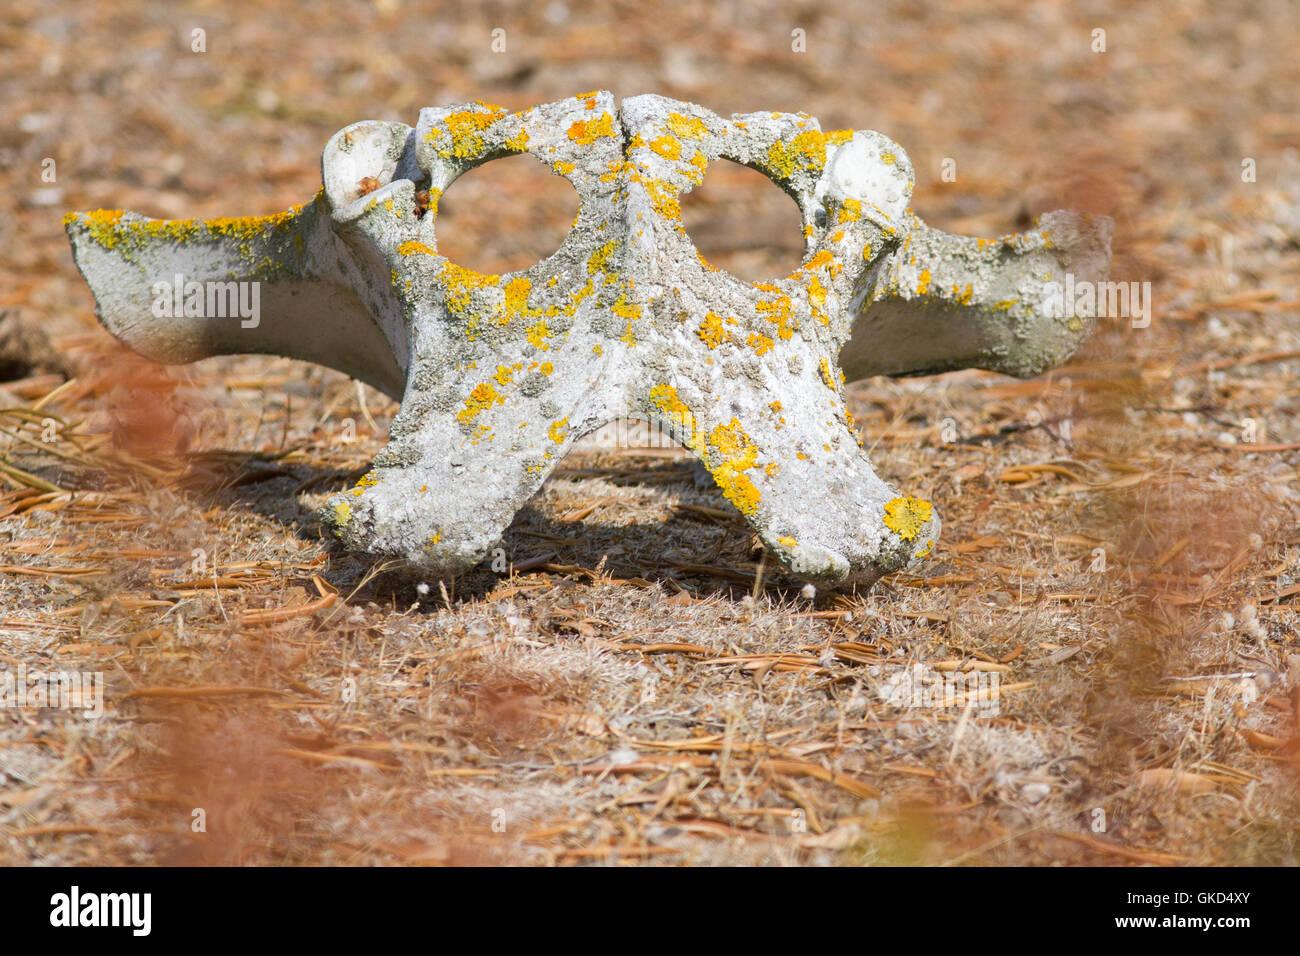 Old wild cow bones, pelvis which resemble an alien skull - Stock Image